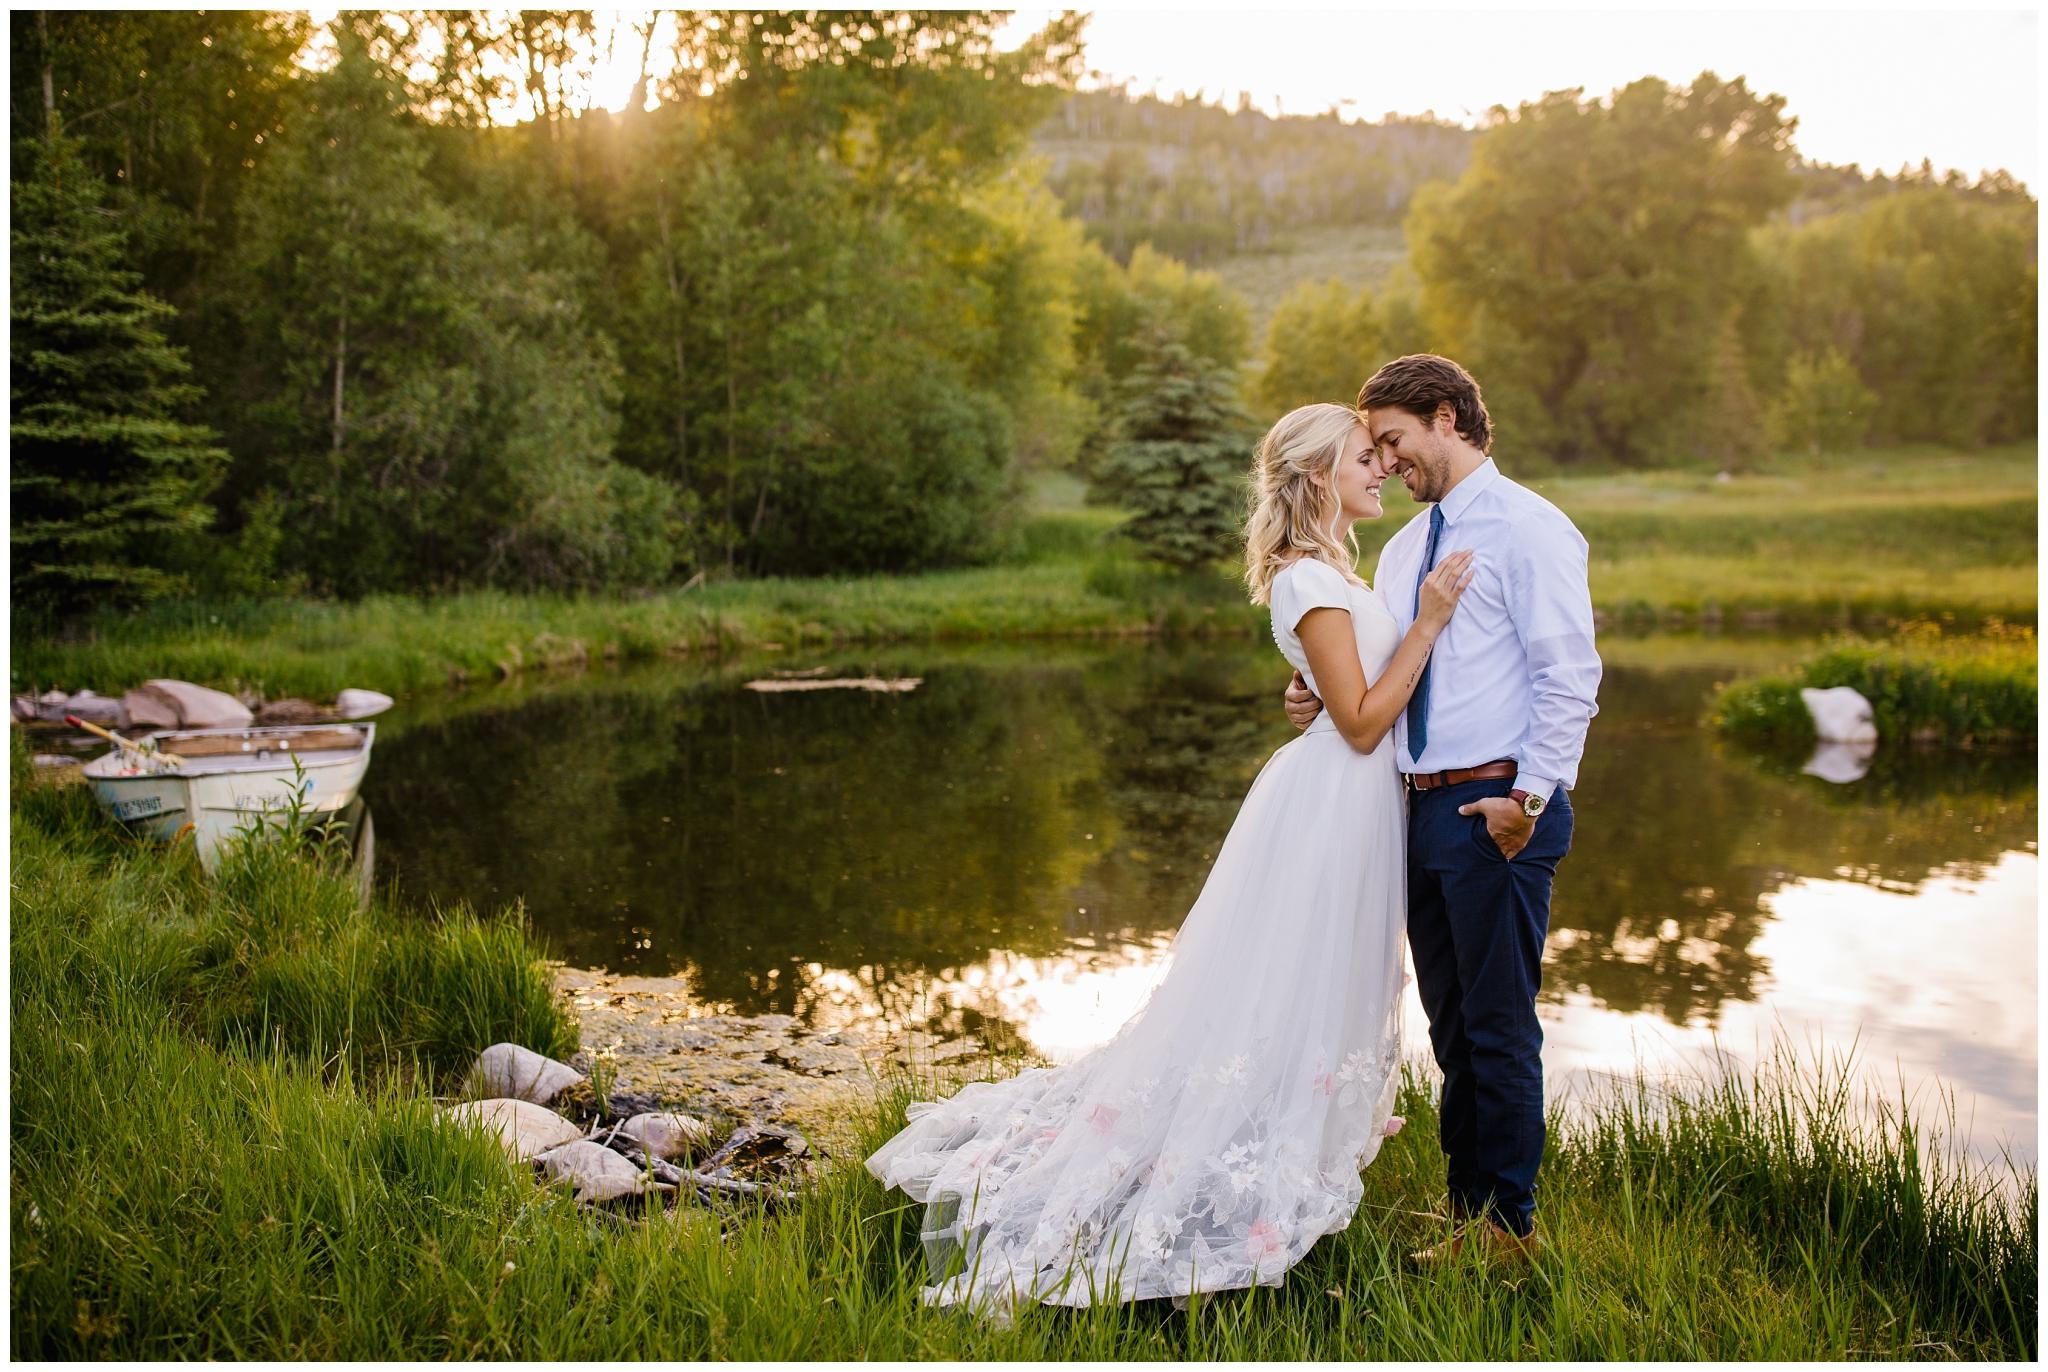 Lizzie-B-Imagery-Utah-Wedding-Photographer-Park-City-Photographer_0052.jpg